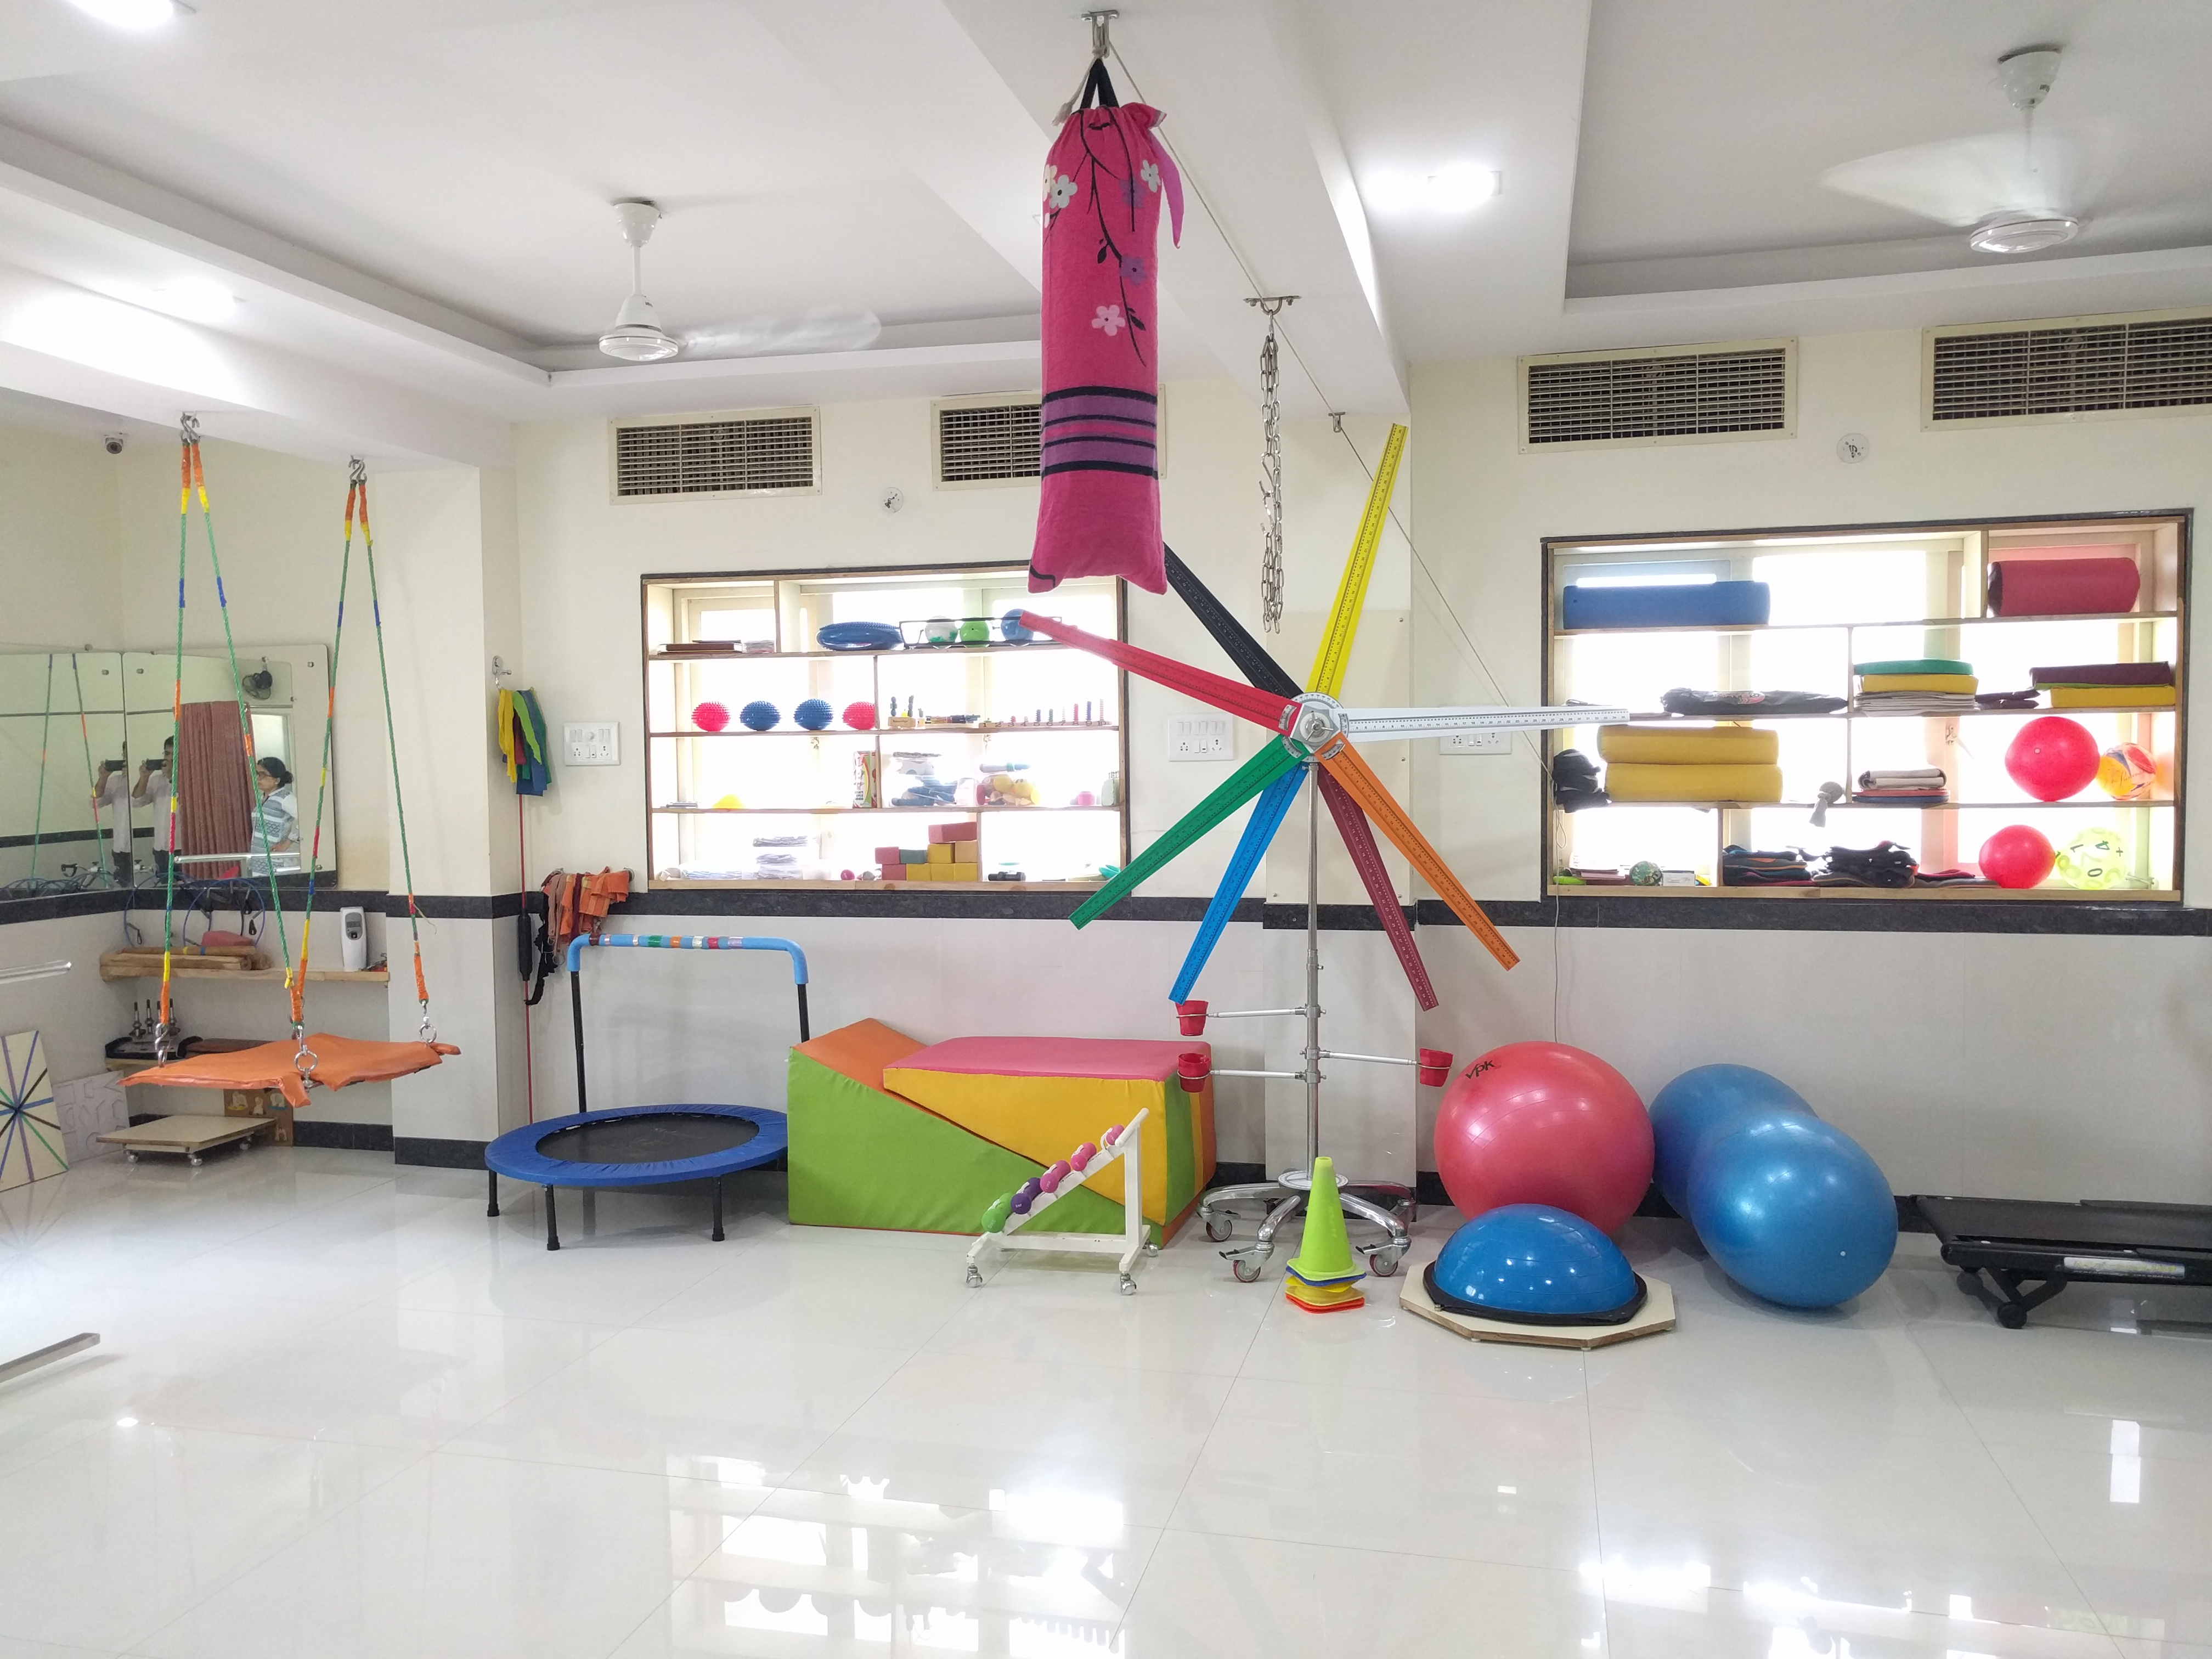 Peaditric & Adult Neuro-Physio-Rehabilitation